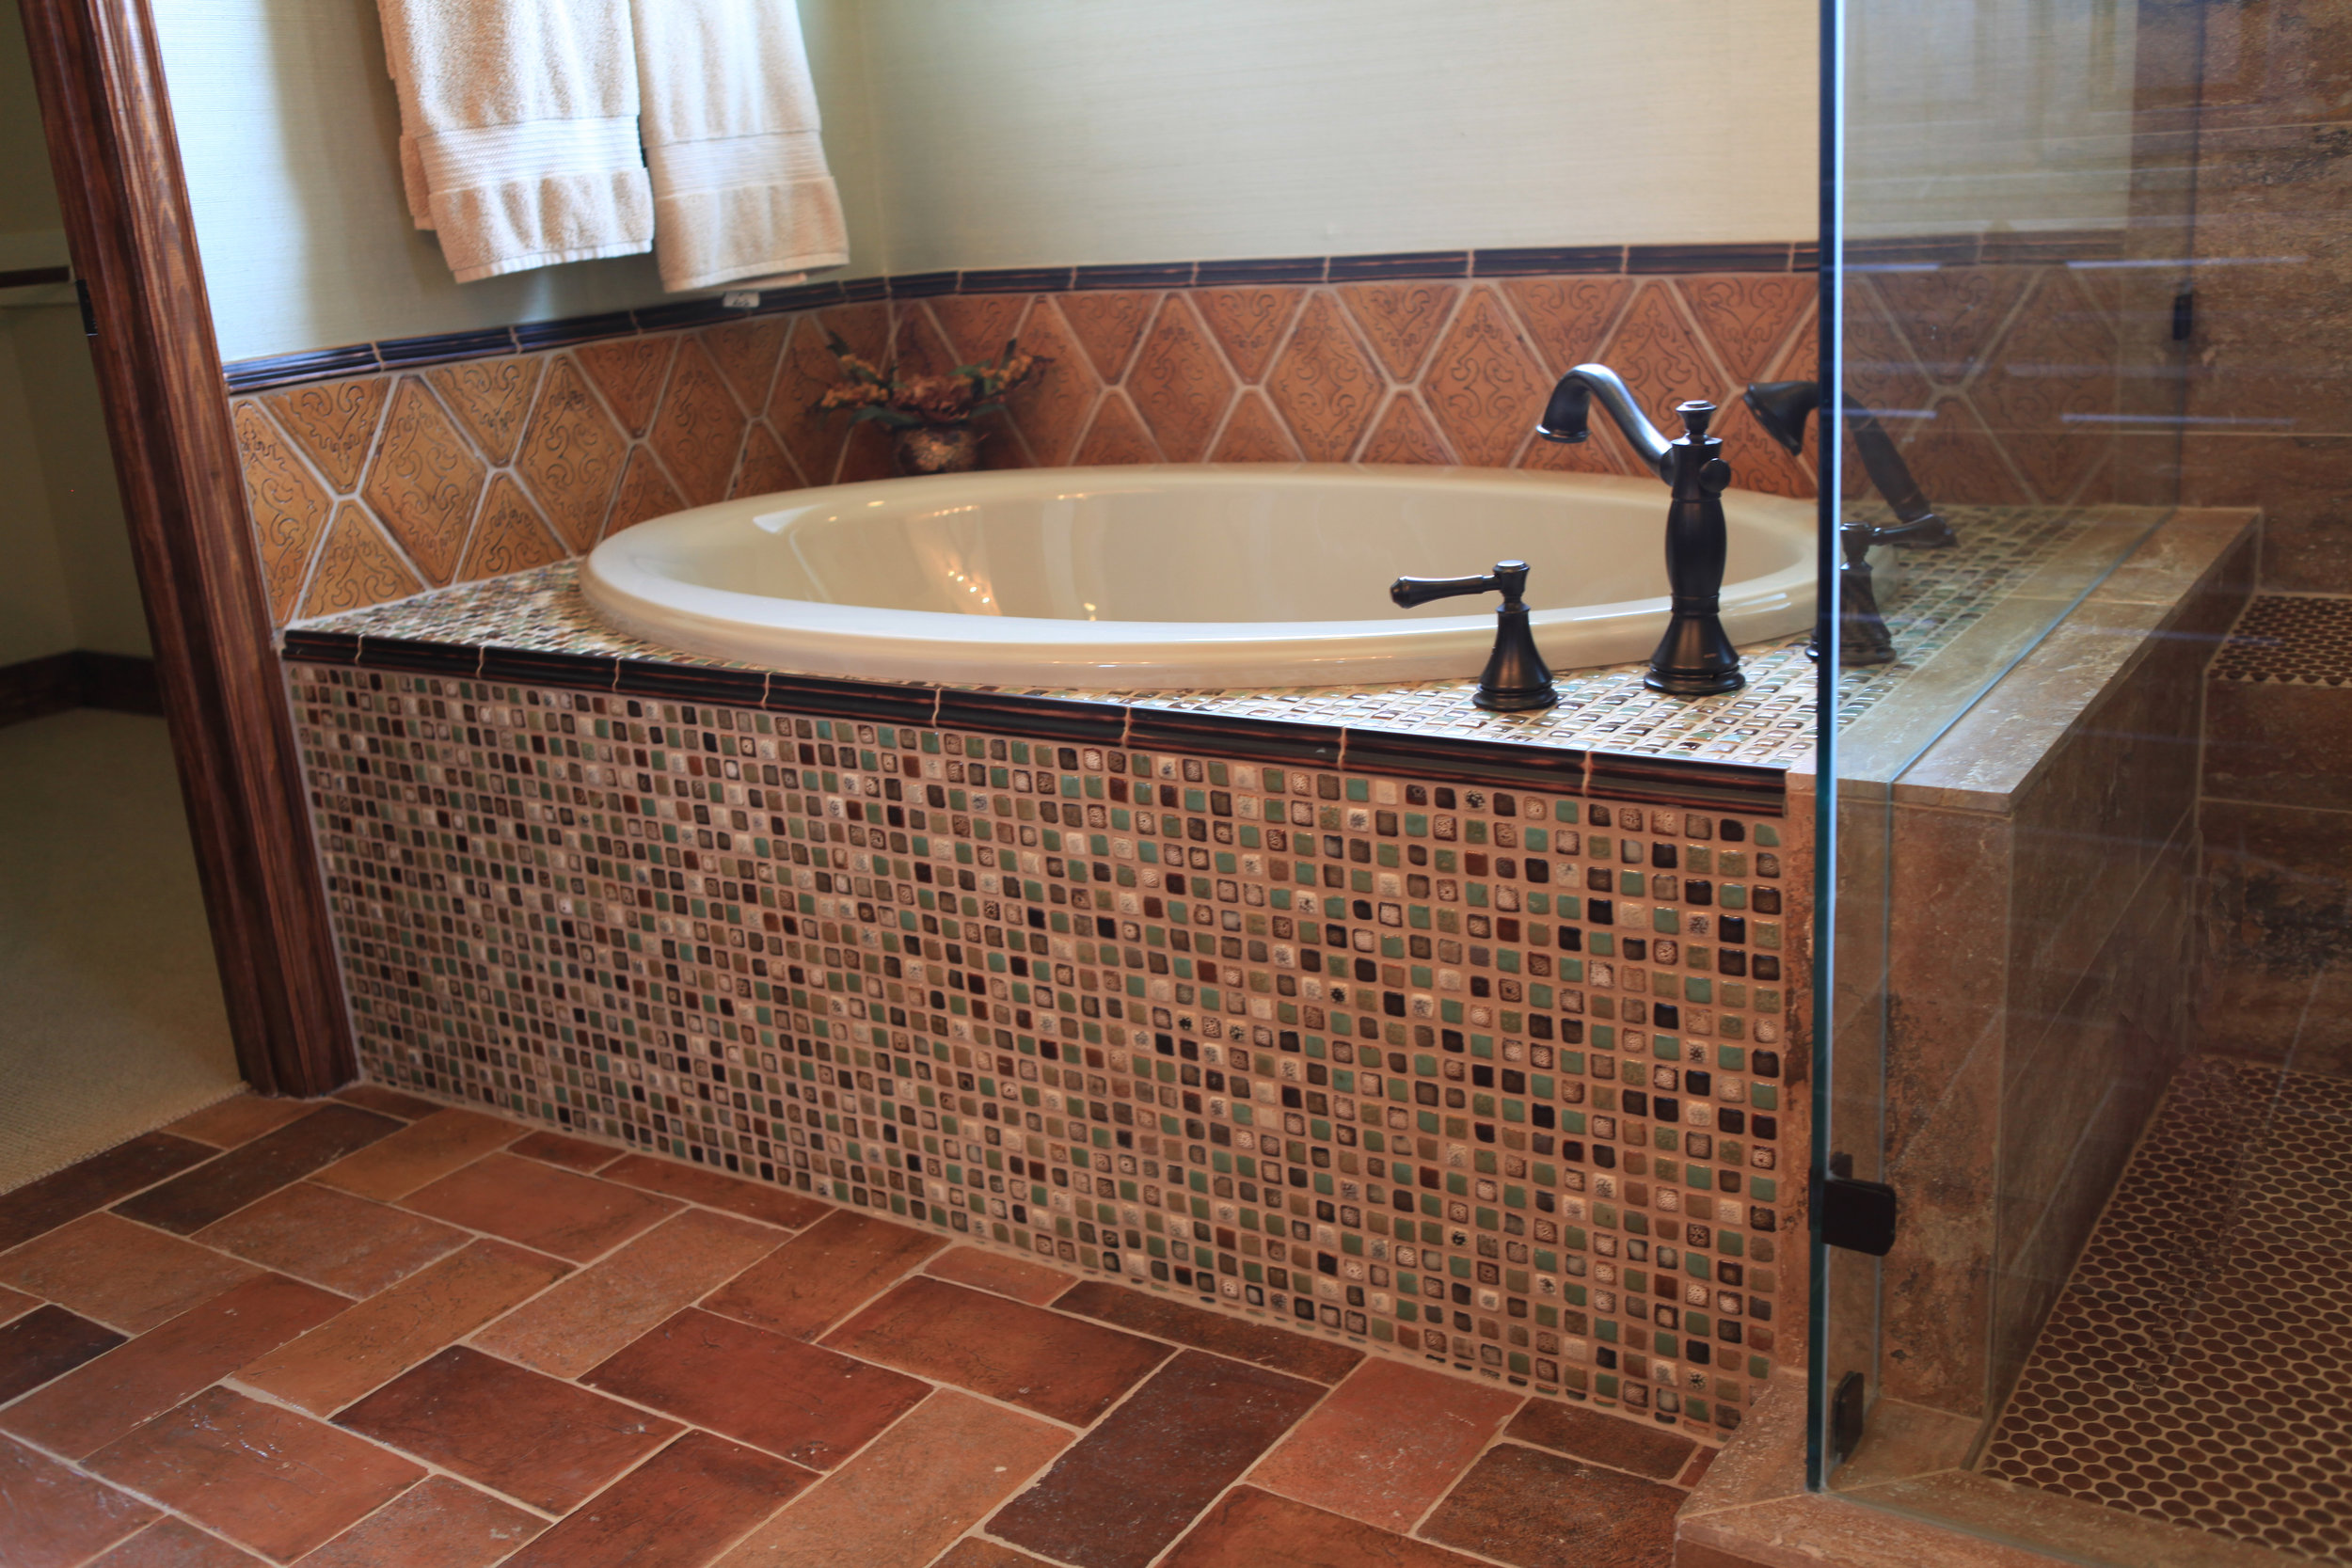 Waterside_Drive - MBR BATH tub detail.JPG